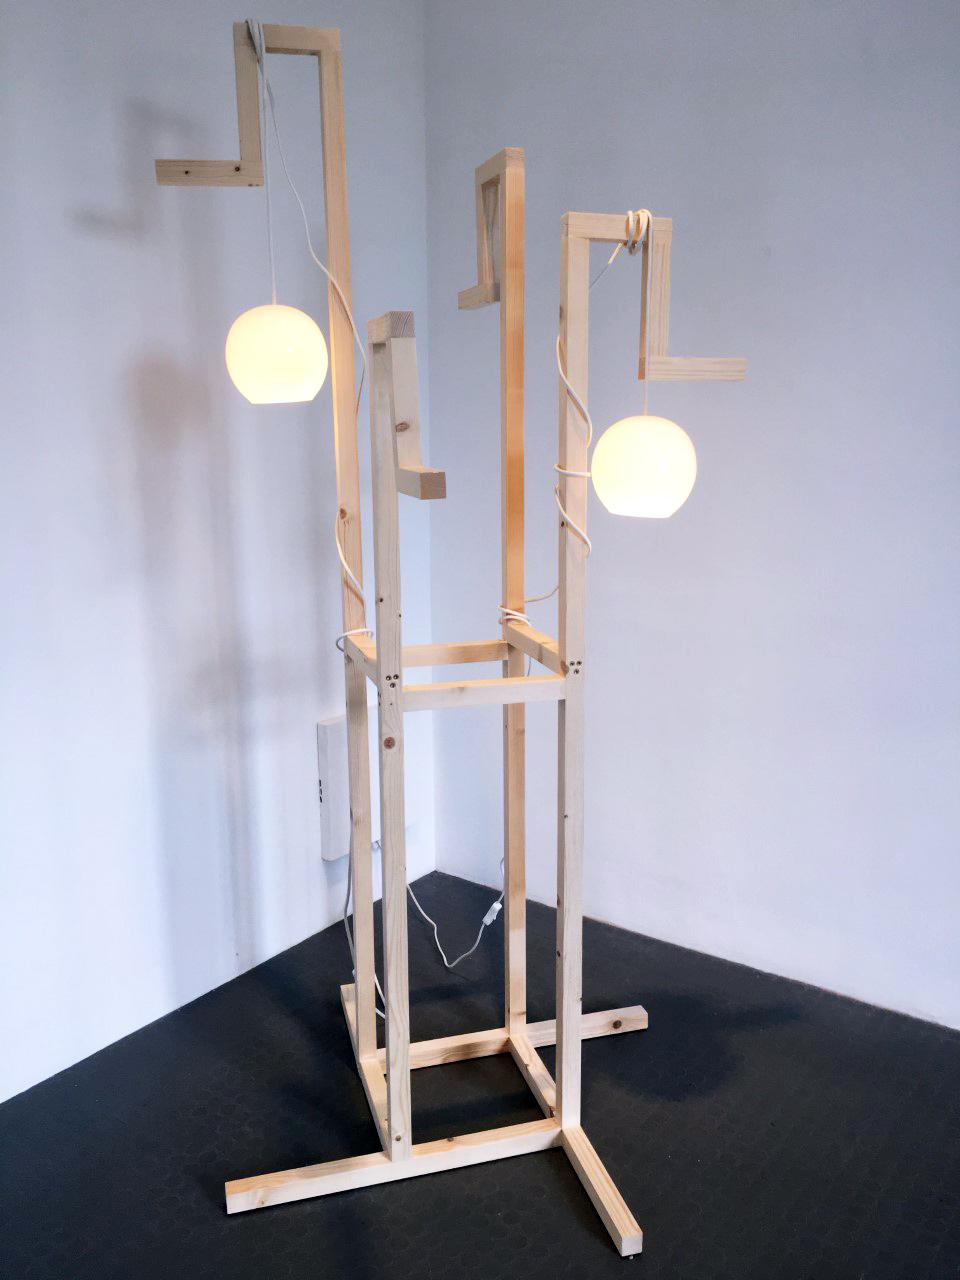 Natalie Finnemore, 'Display', 2019